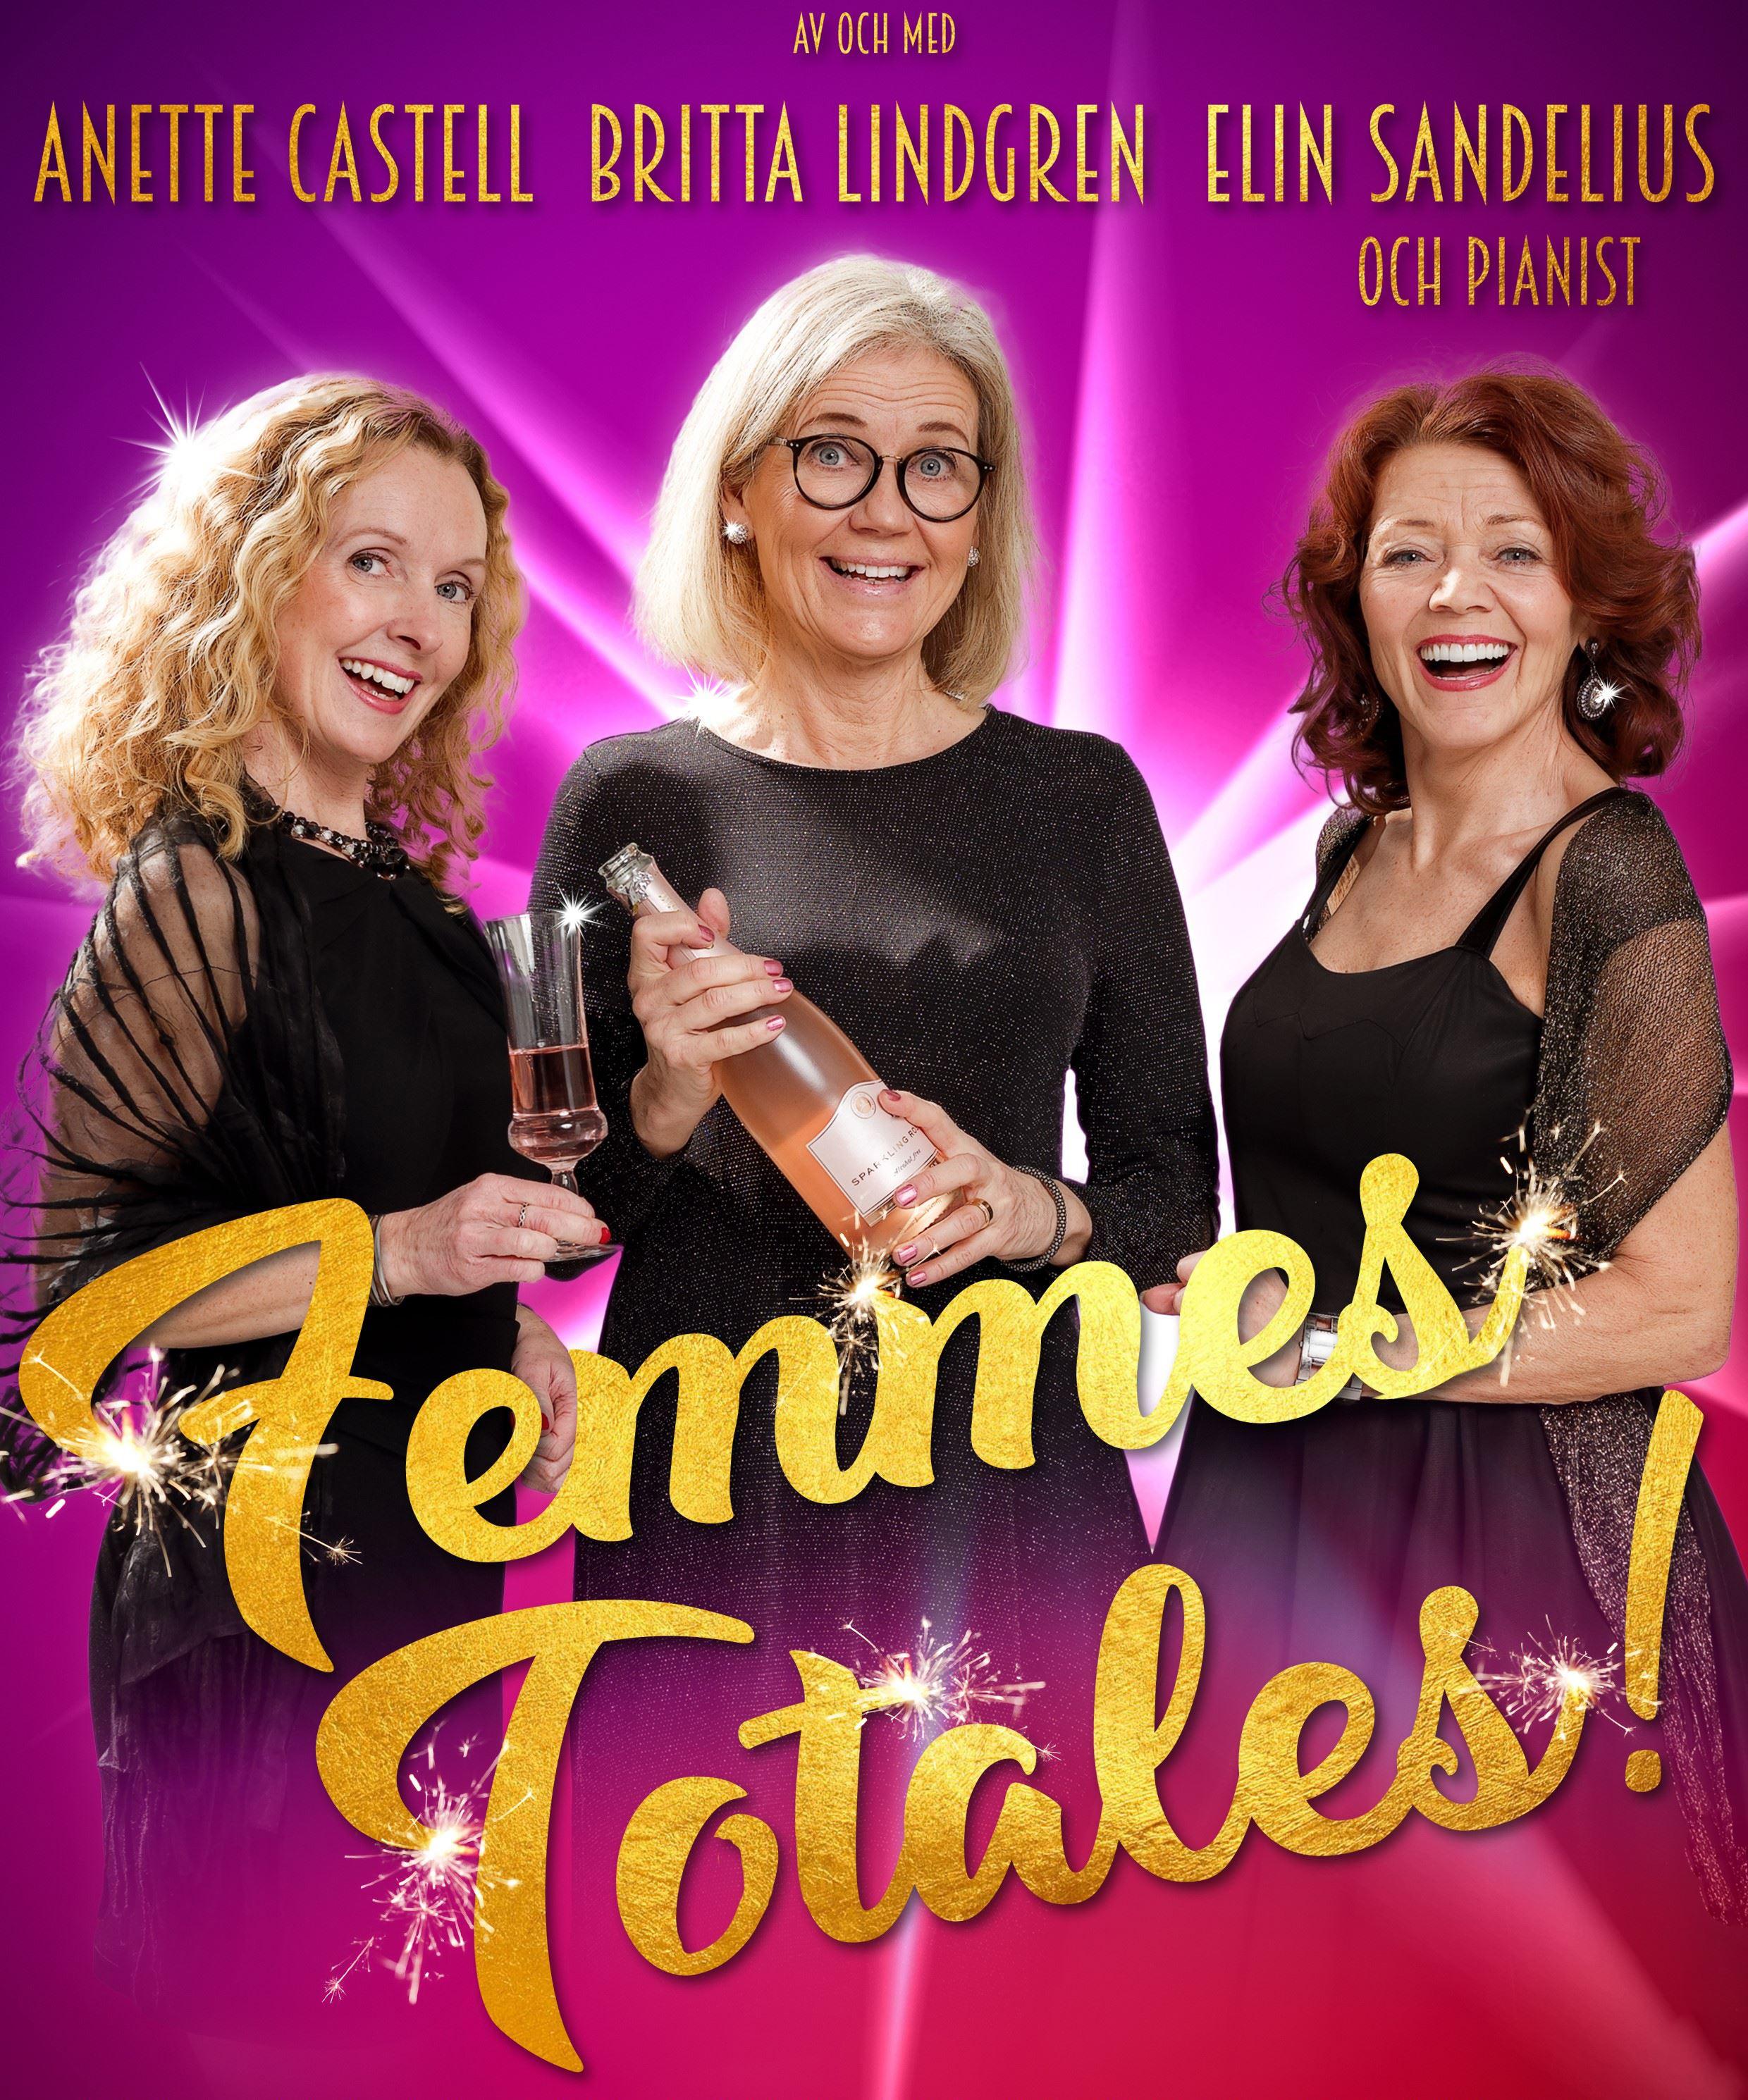 Femmes Totales!